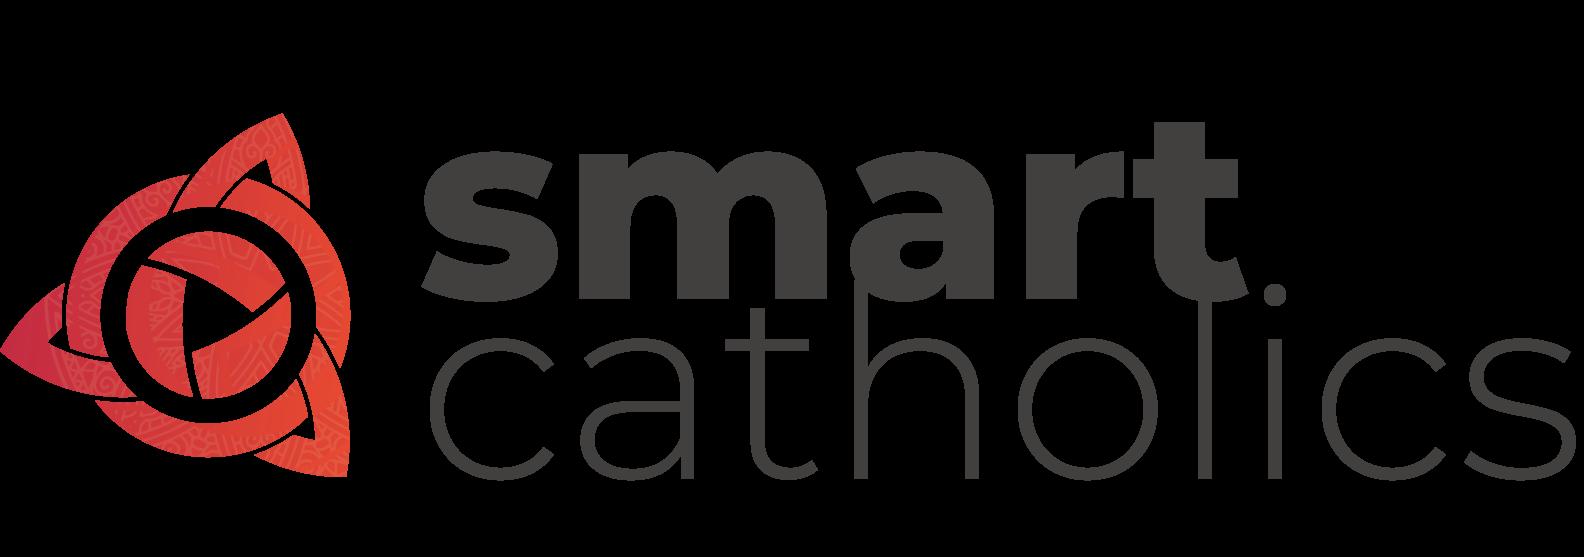 SmartCatholics